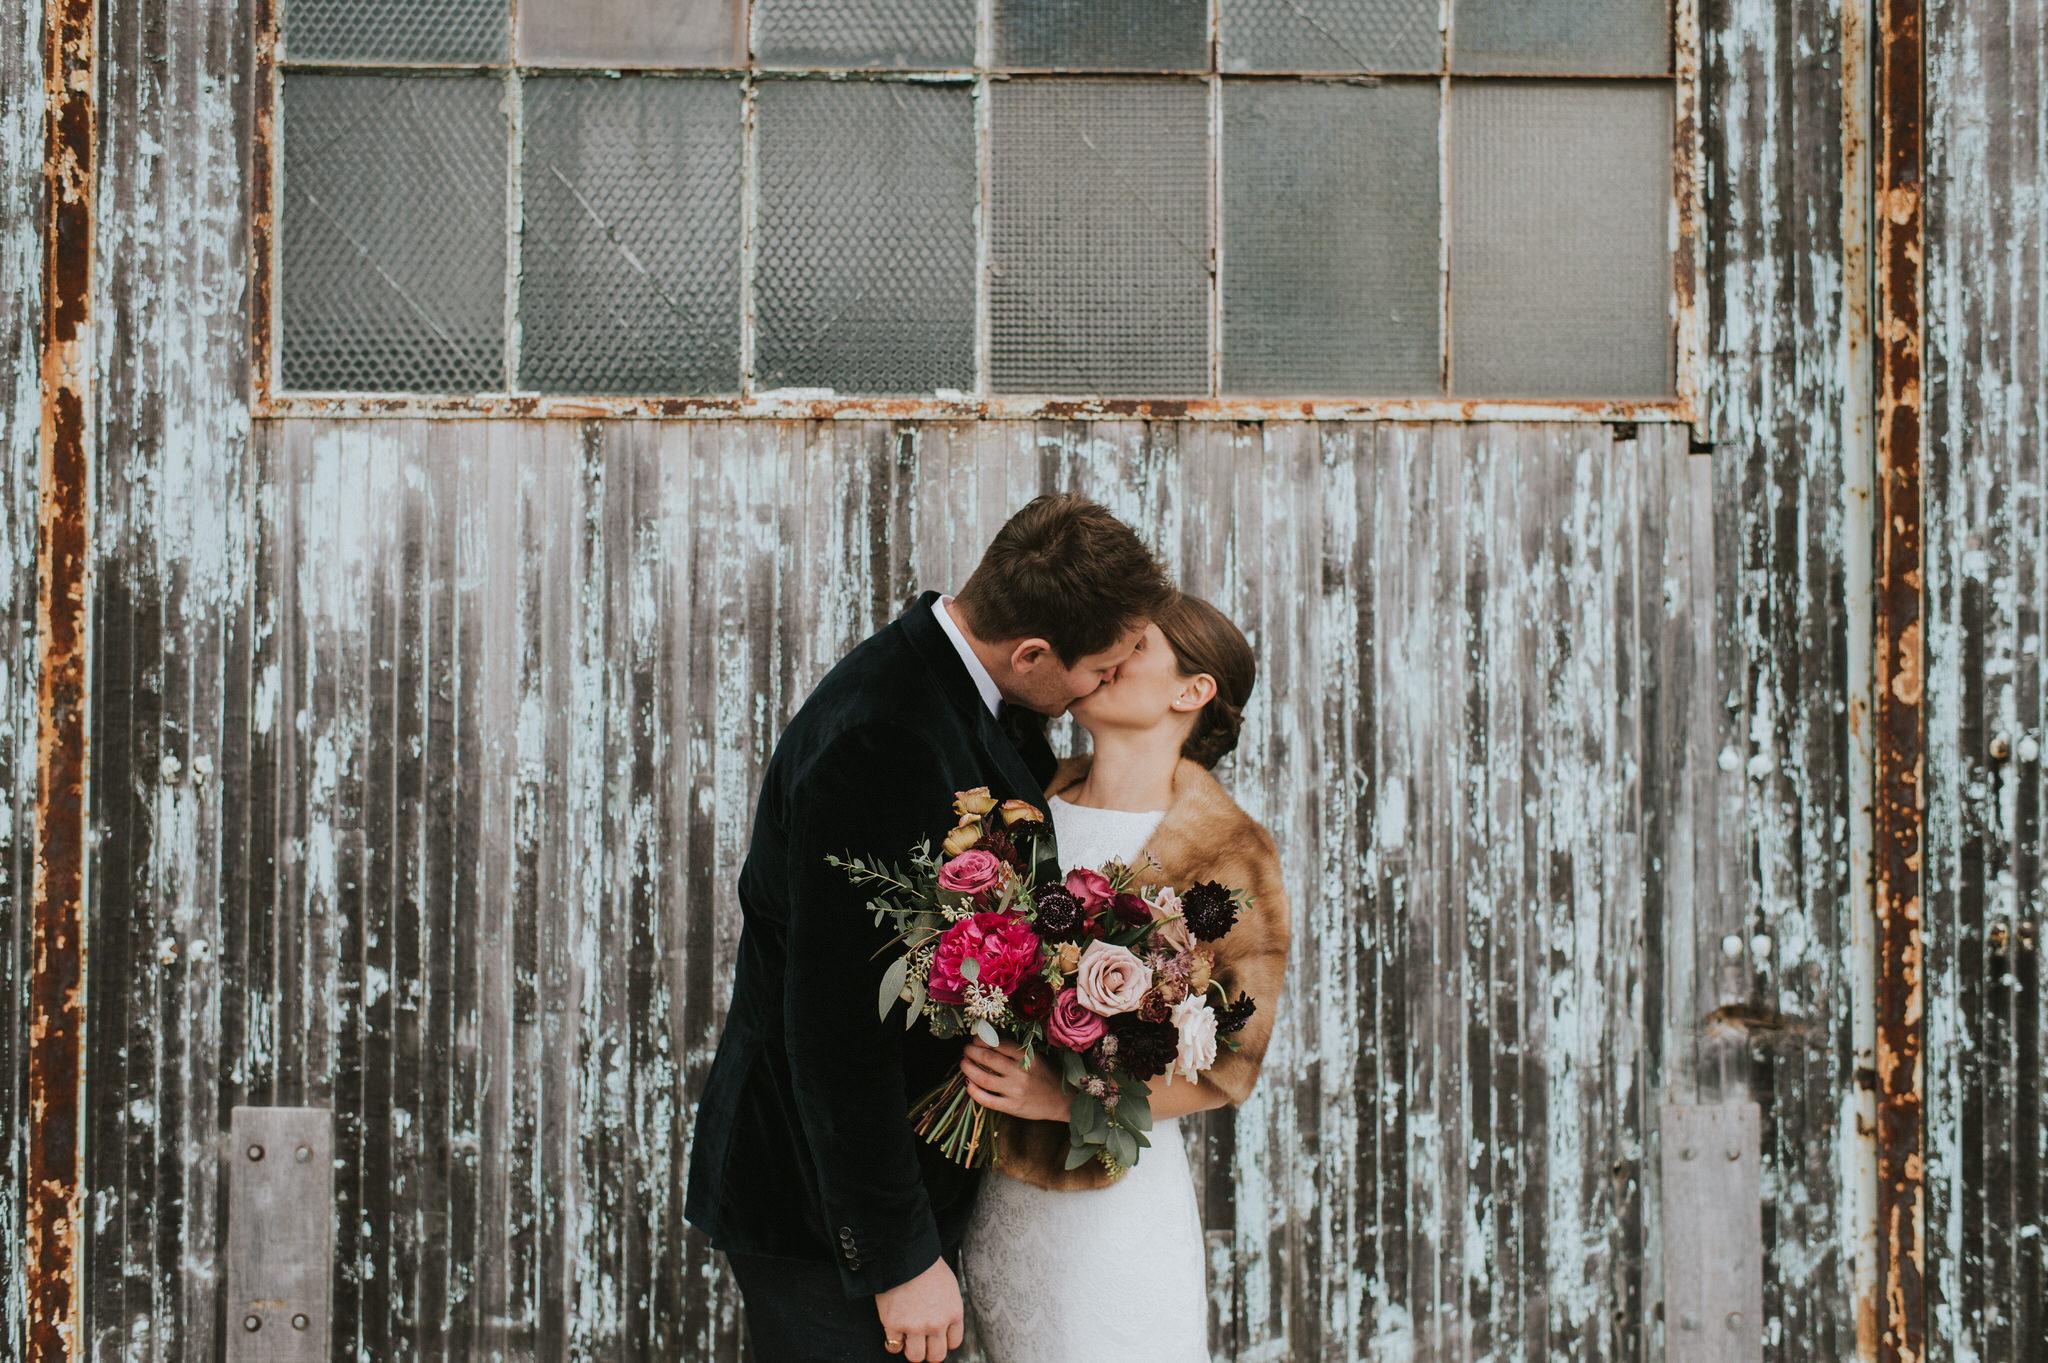 scarletoneillphotography_weddingphotography_prince edward county weddings069.JPG